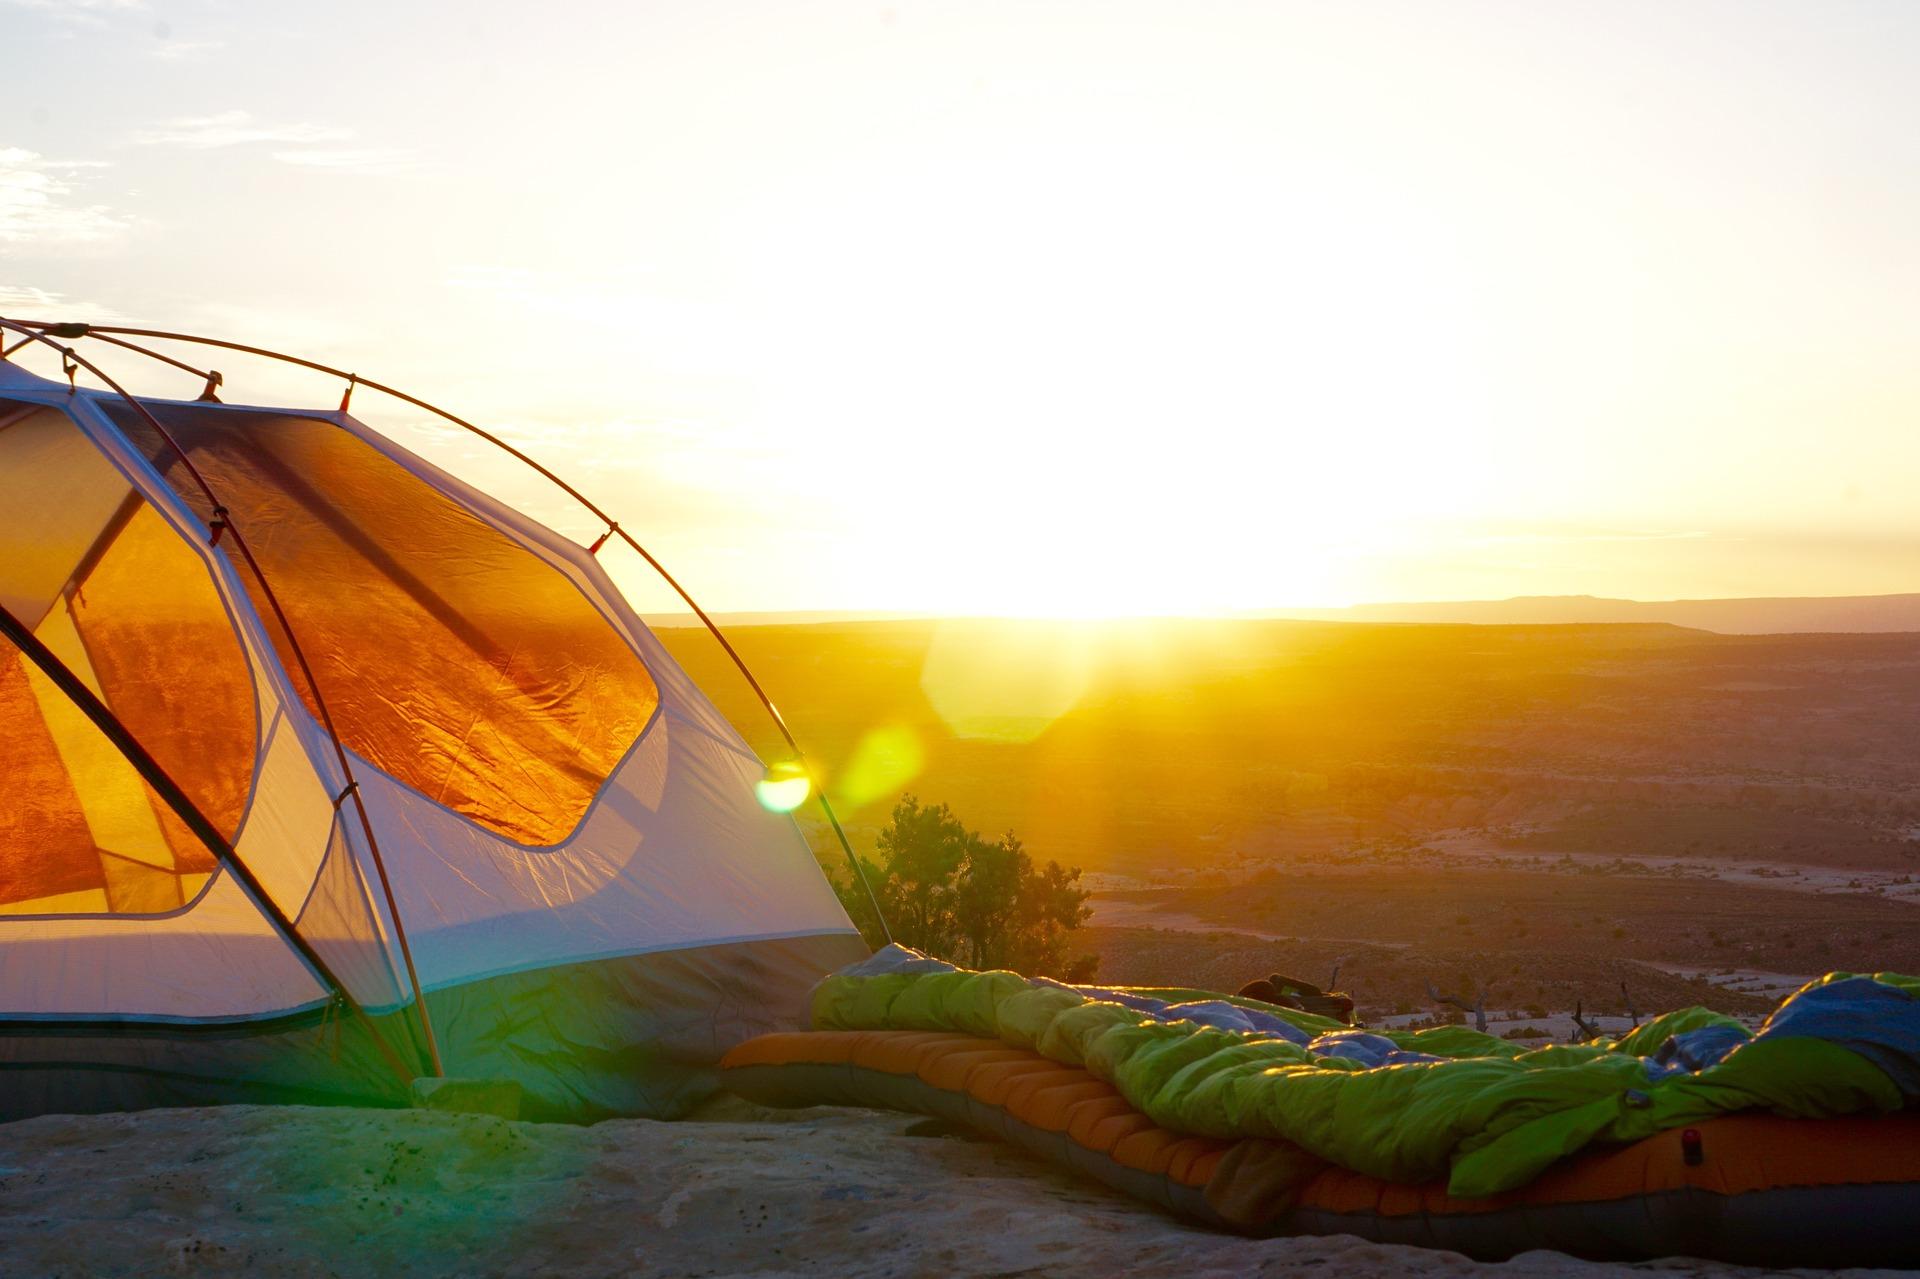 How Do You Dry Out A Tent How Do You Dry Out A Tent?